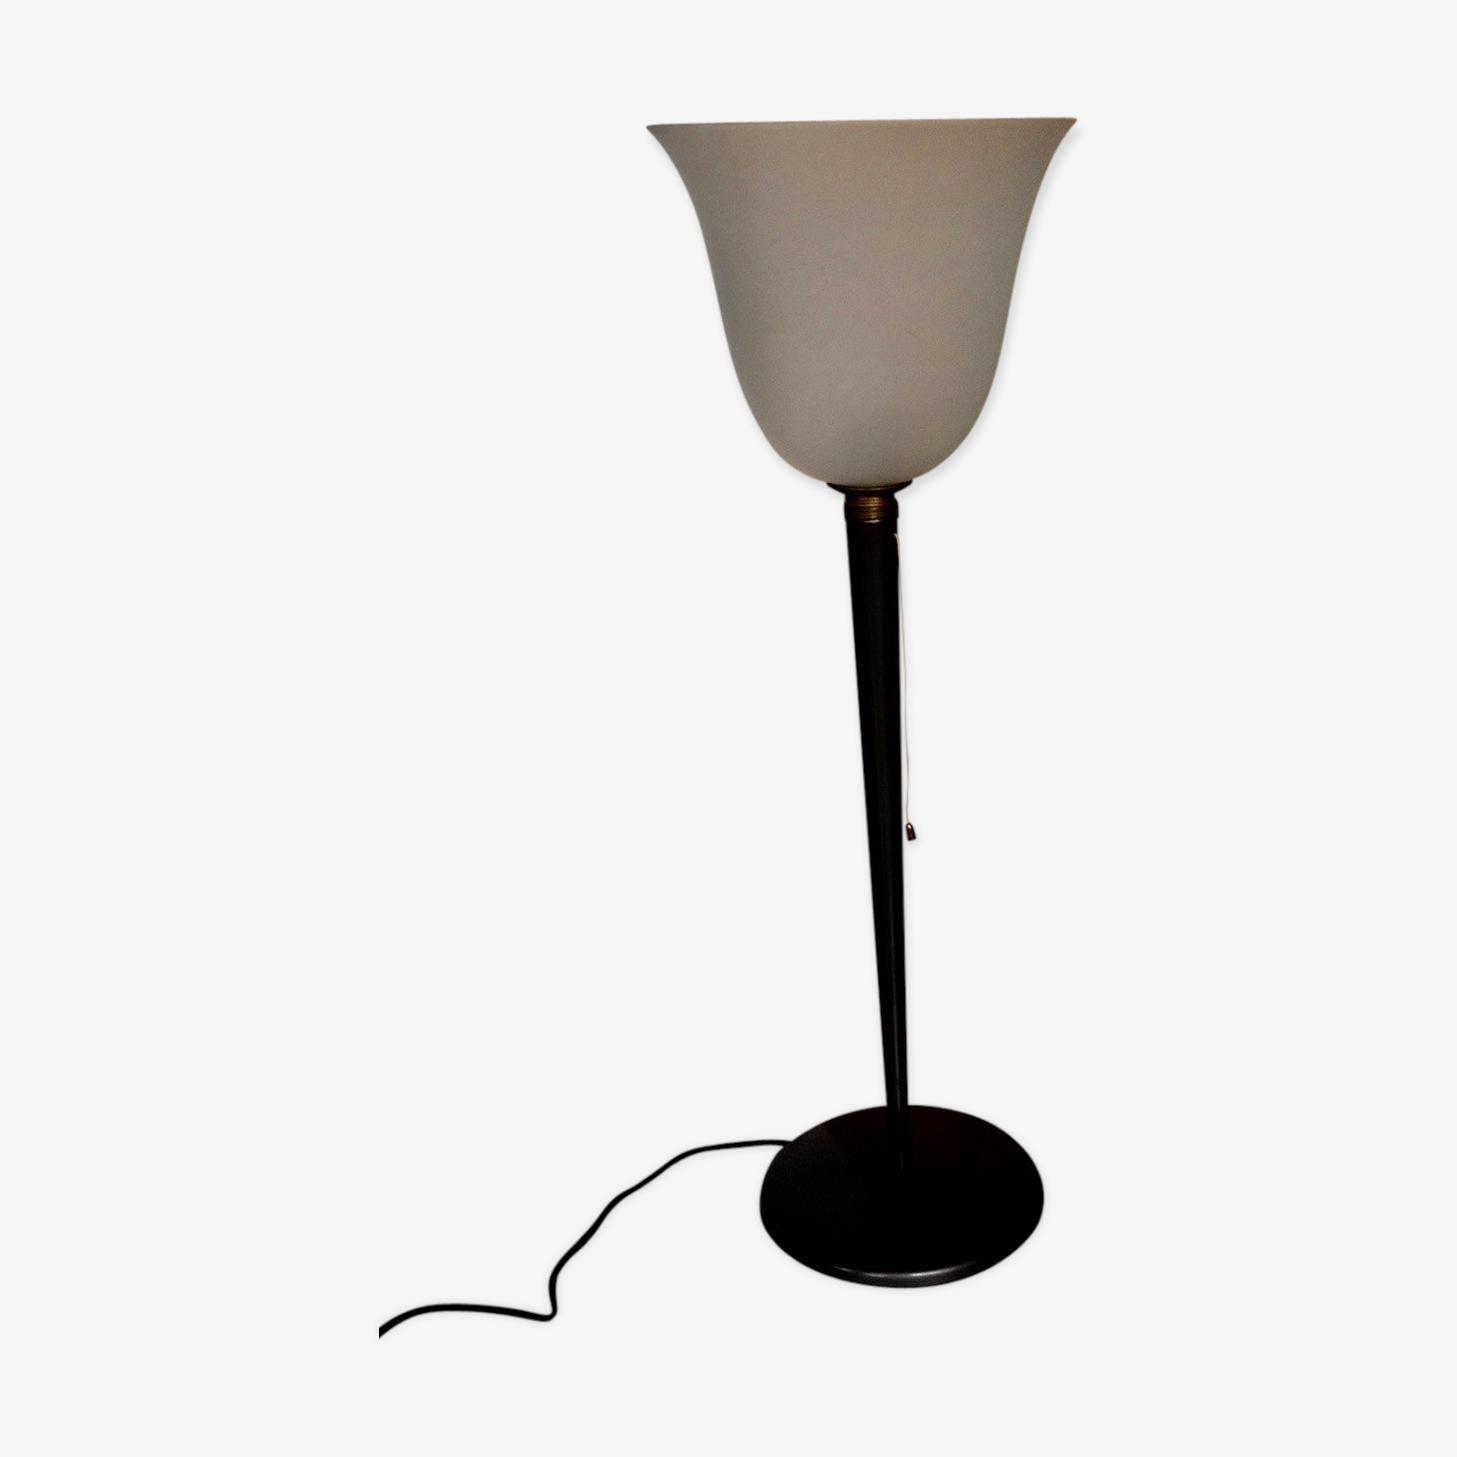 Lampe Mazda Tulipe Art Deco Metal Gris Art Deco 78fa9yi